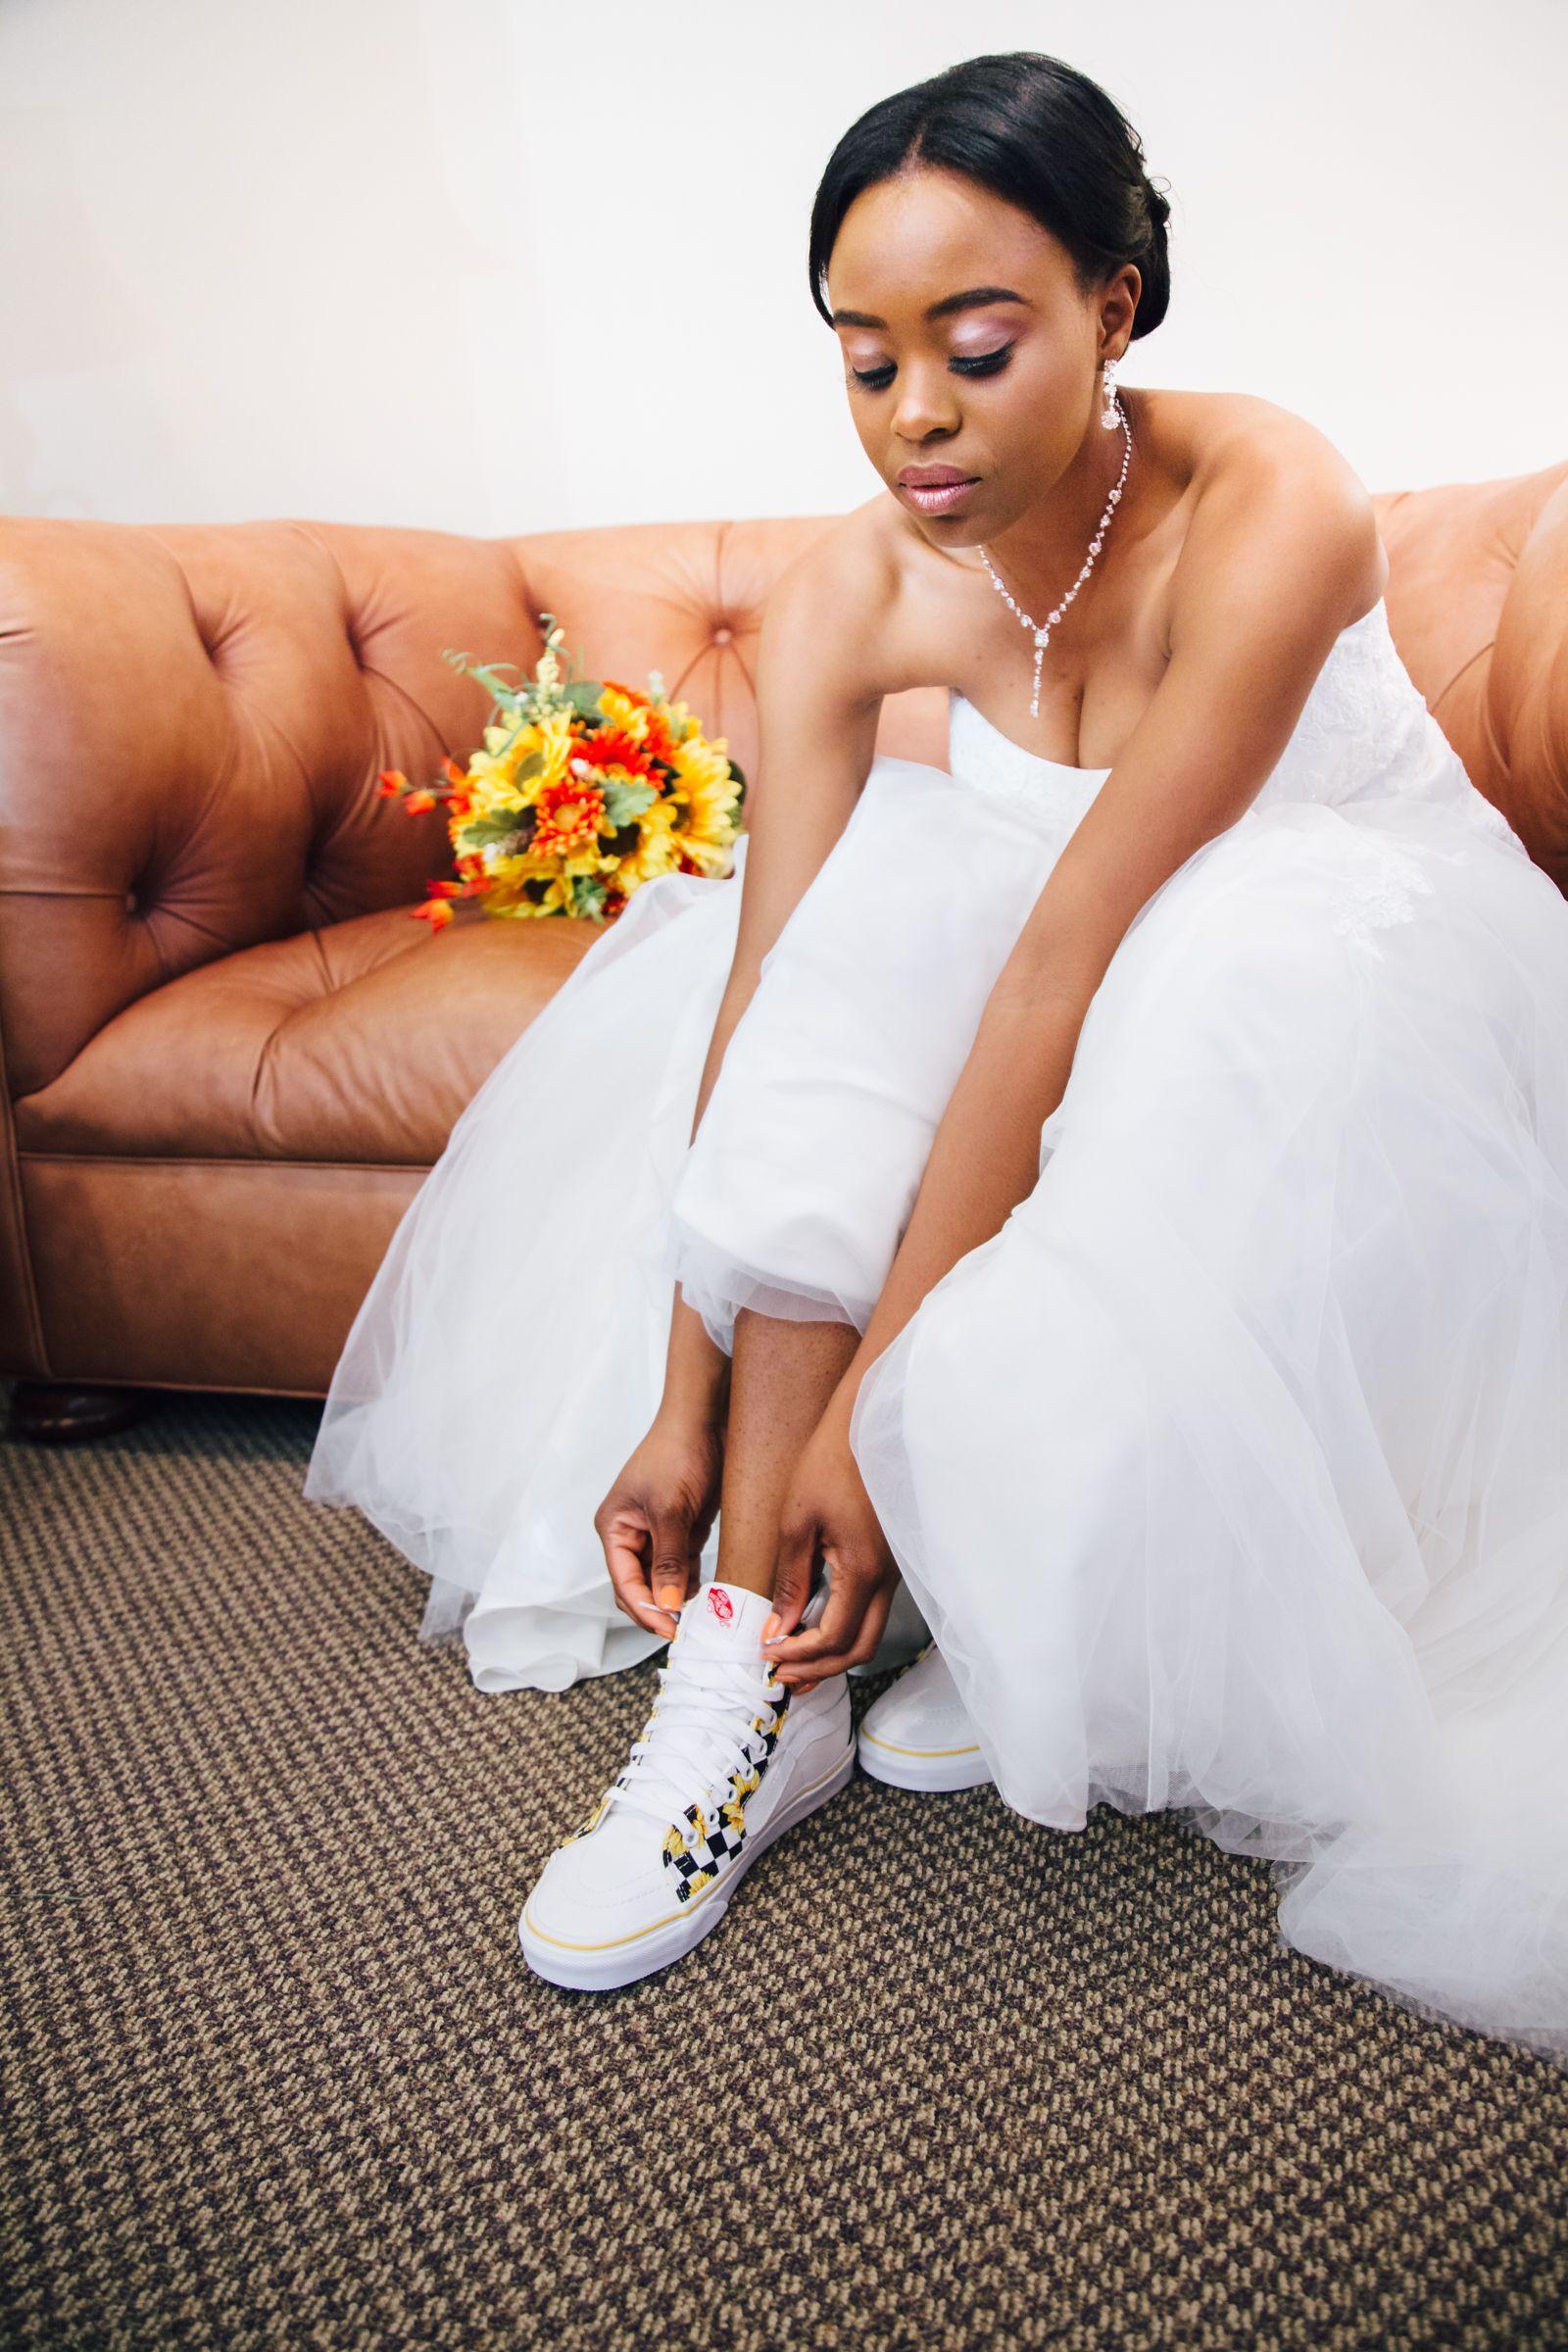 25+ Vans wedding tennis shoes ideas in 2021